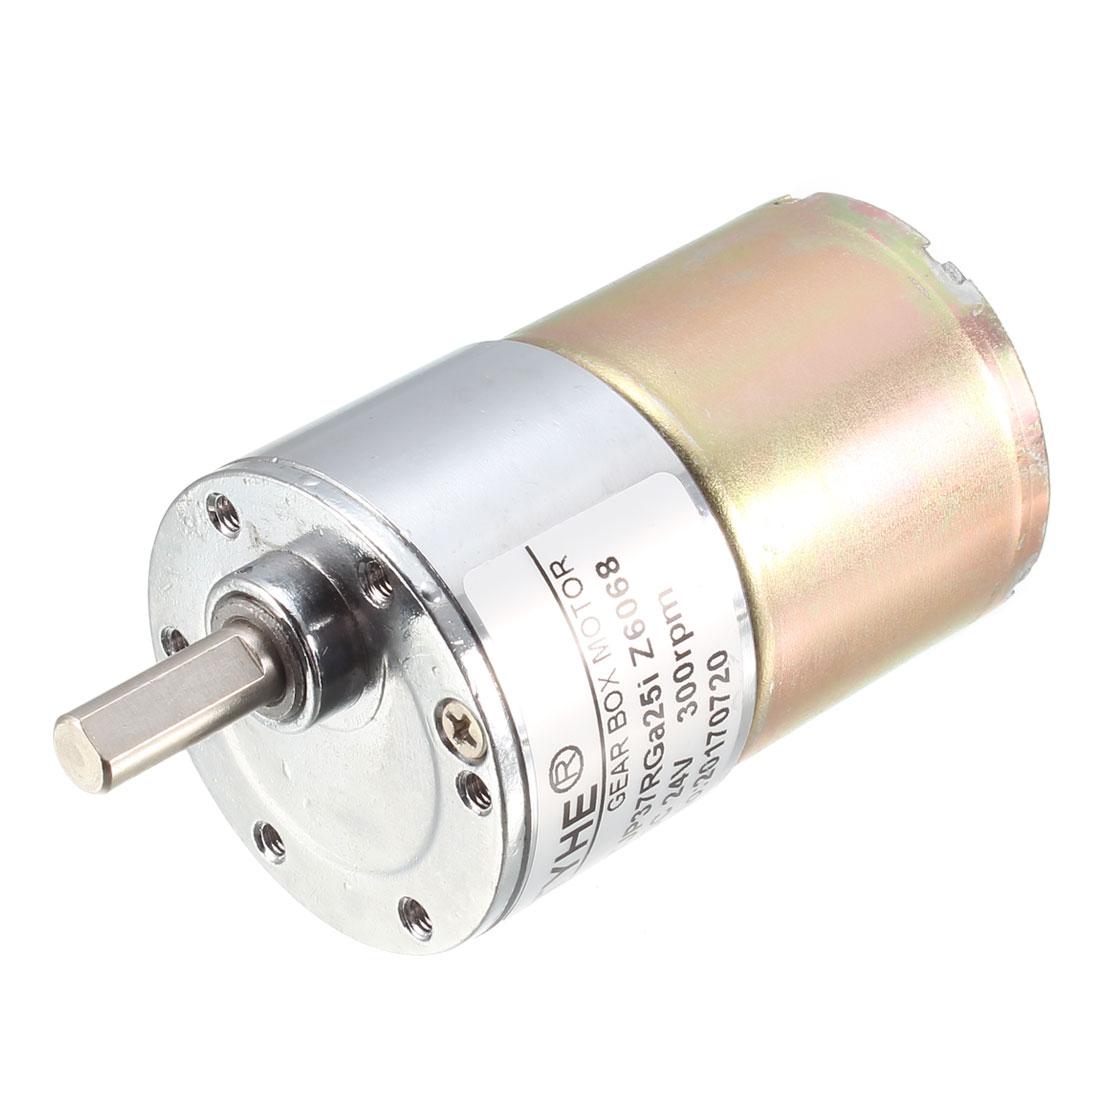 TJP37RGa25i-Z6068 6mm Dia Eccentric Shaft Gear Reduction DC Motor DC 24V 300RPM